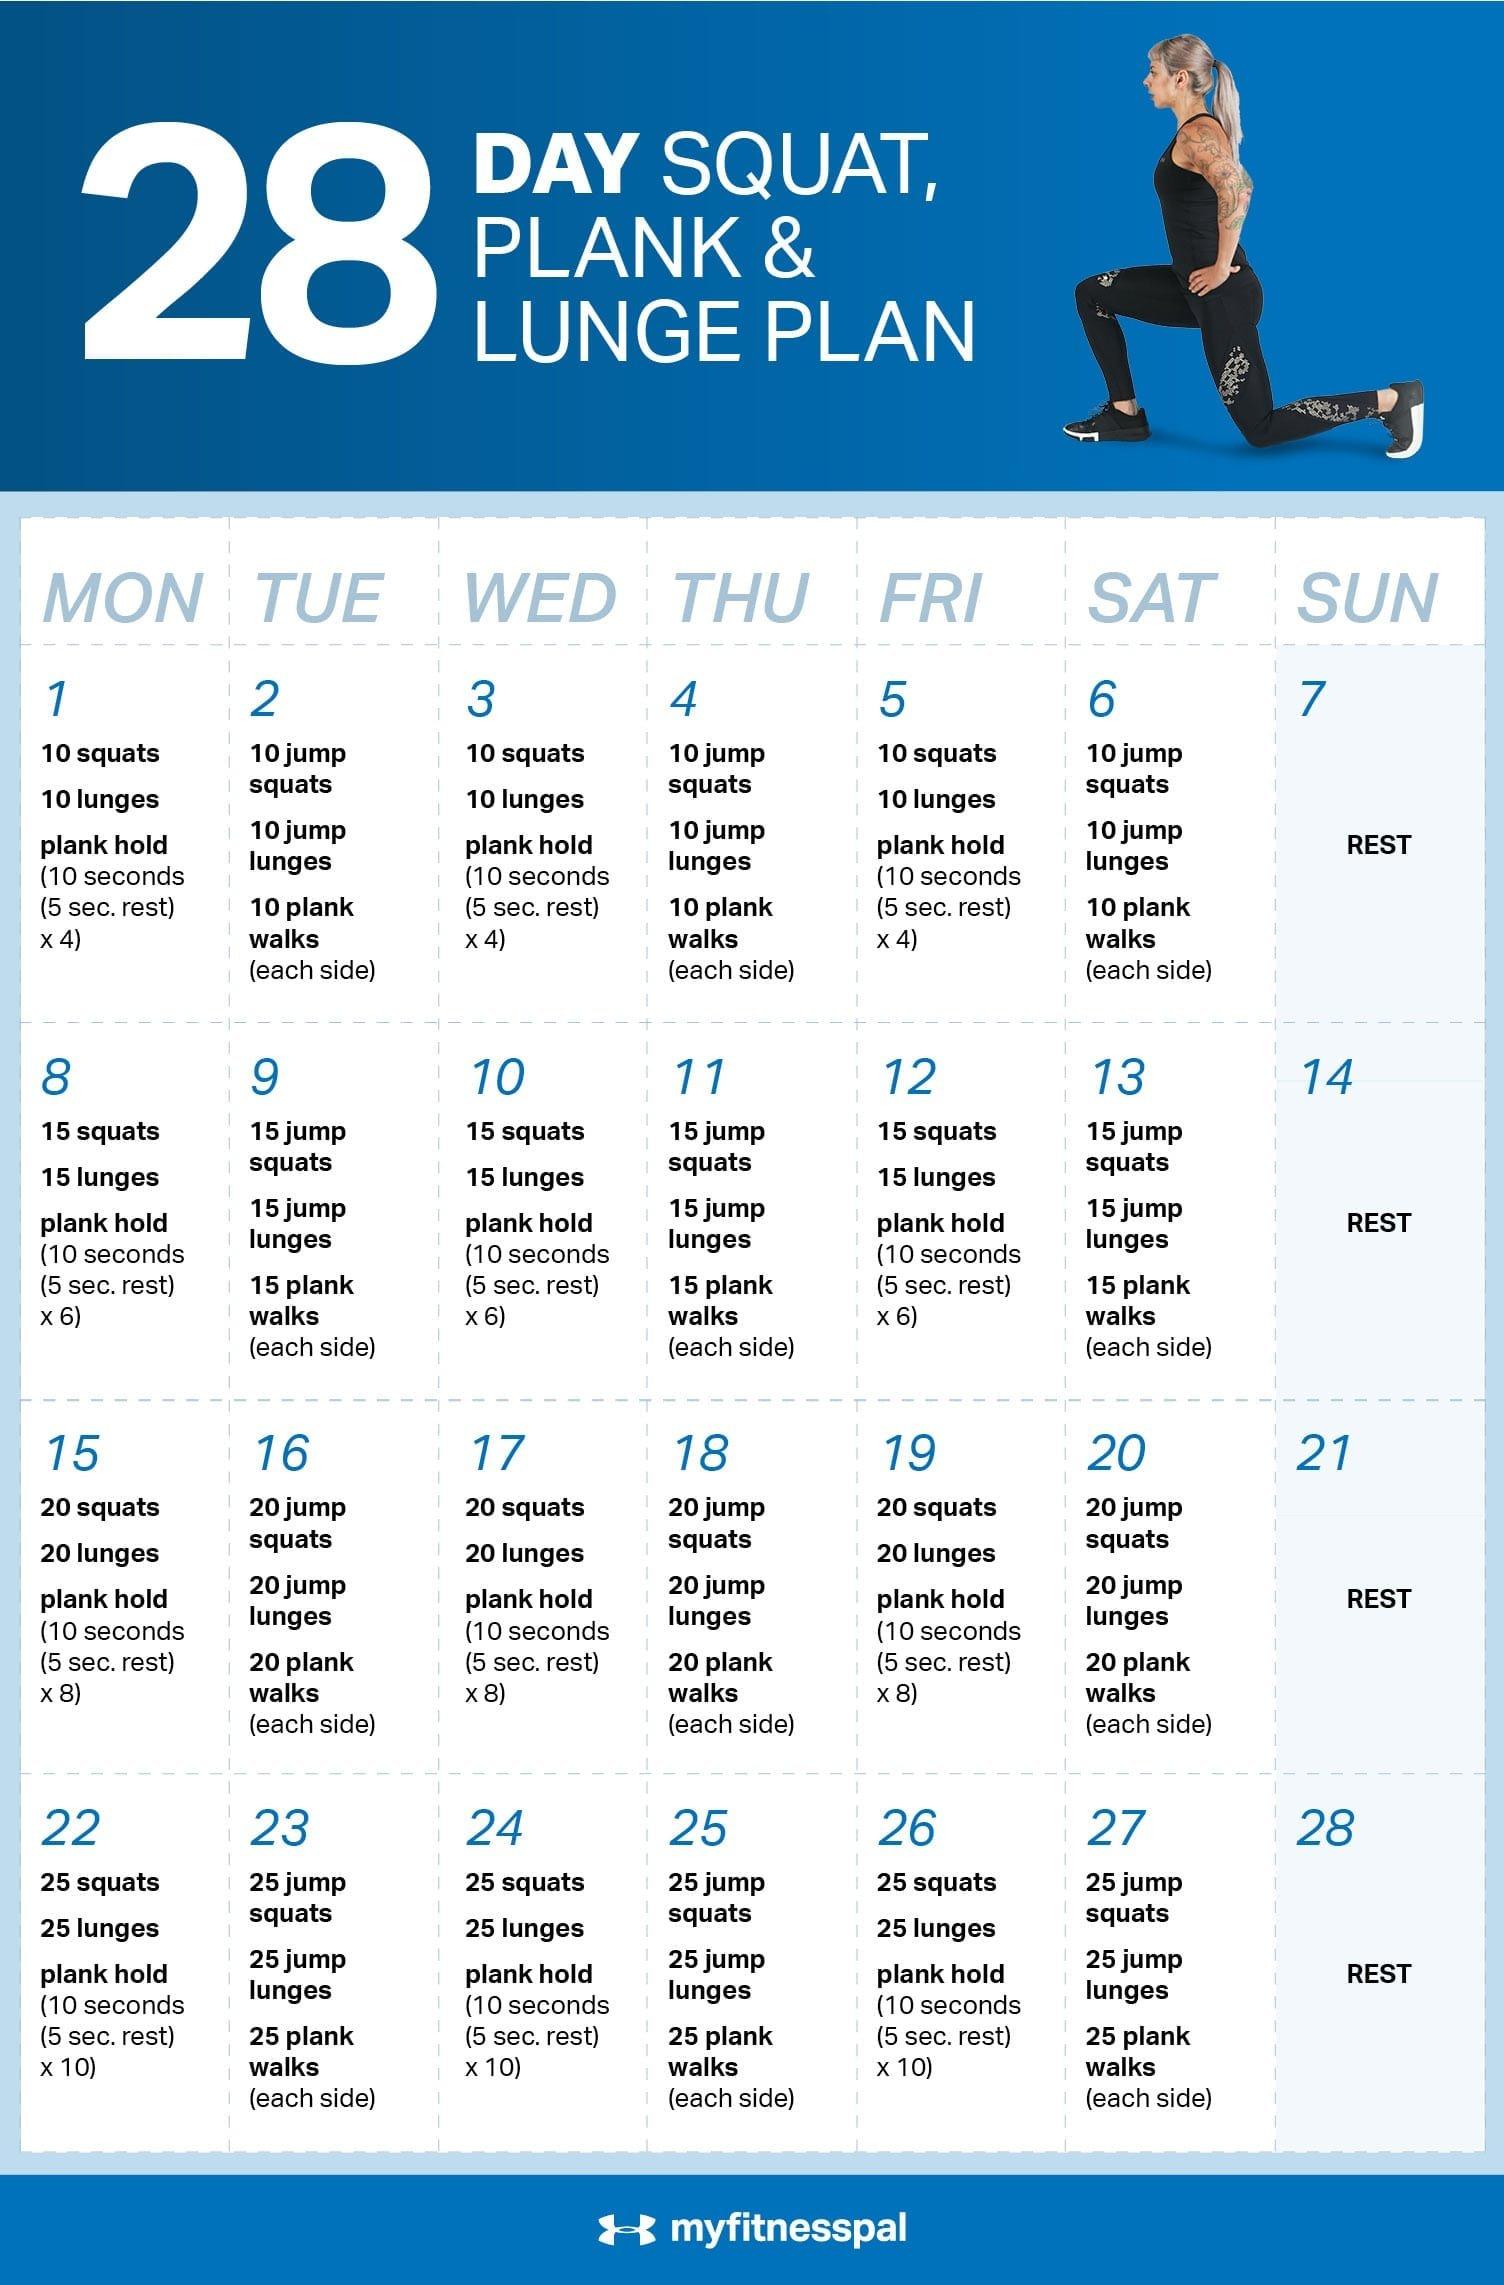 28 Day Squat, Plank & Lunge Plan | Fitness | Myfitnesspal Squat Challenge Calendar Beginner Printable